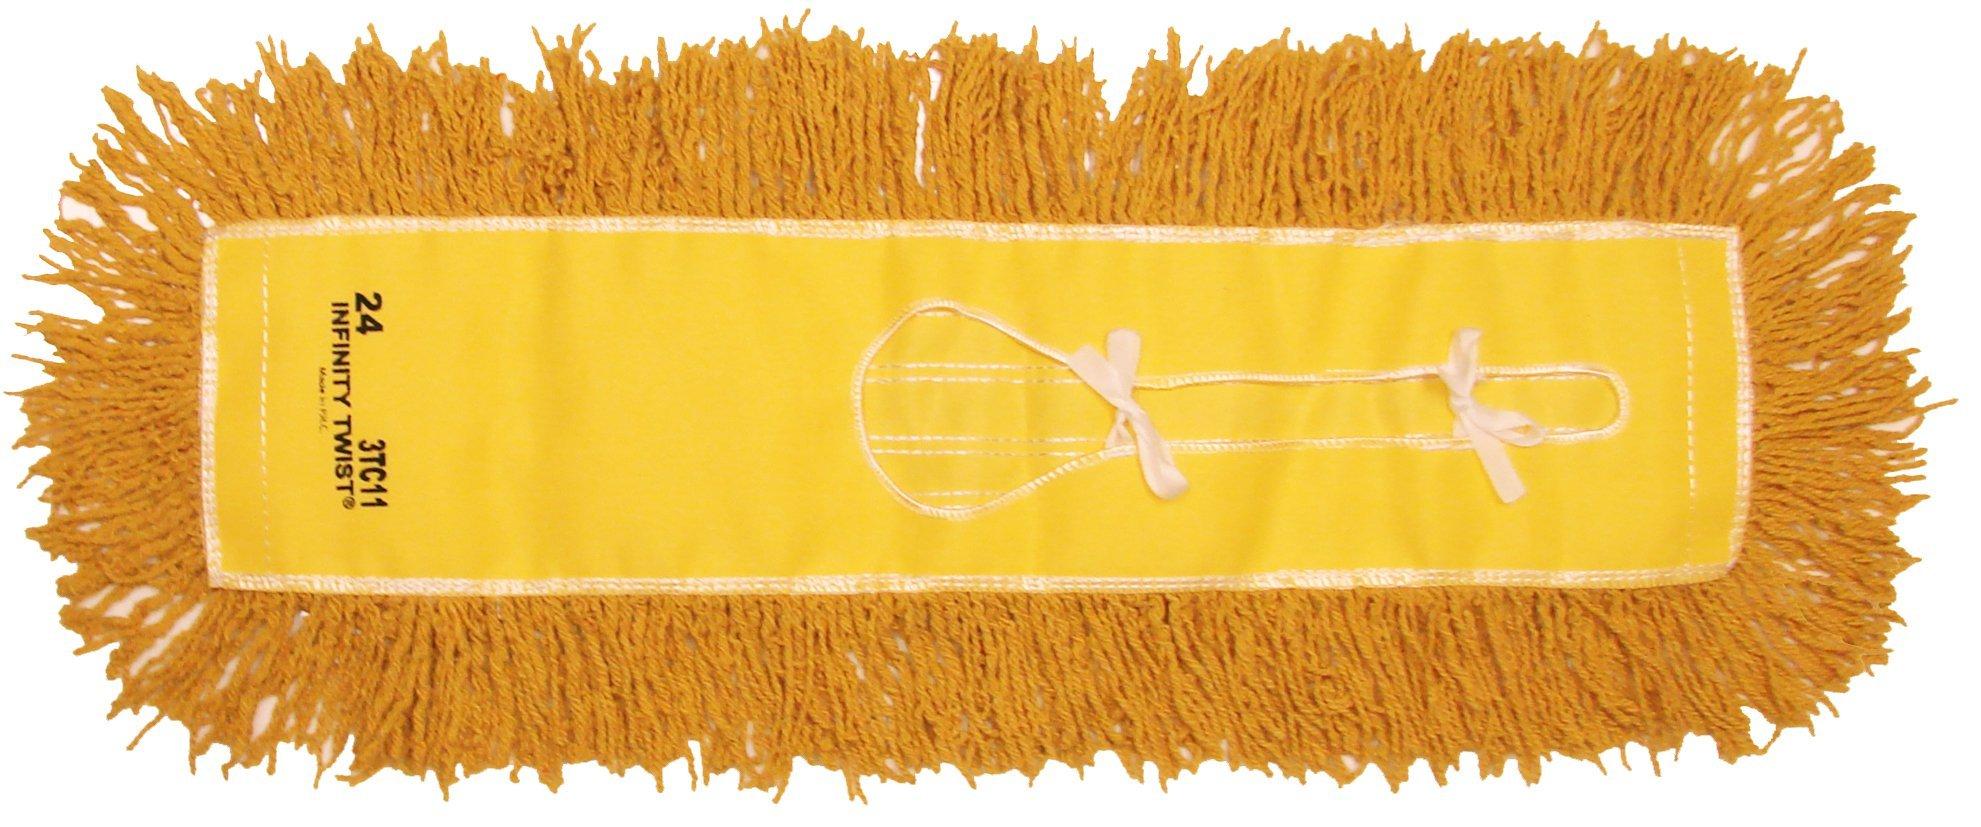 Golden Star AJU24CITY Jumbo Infinity Twist Dust Mop Head, 5'' x 24'', Yellow (Pack of 12)